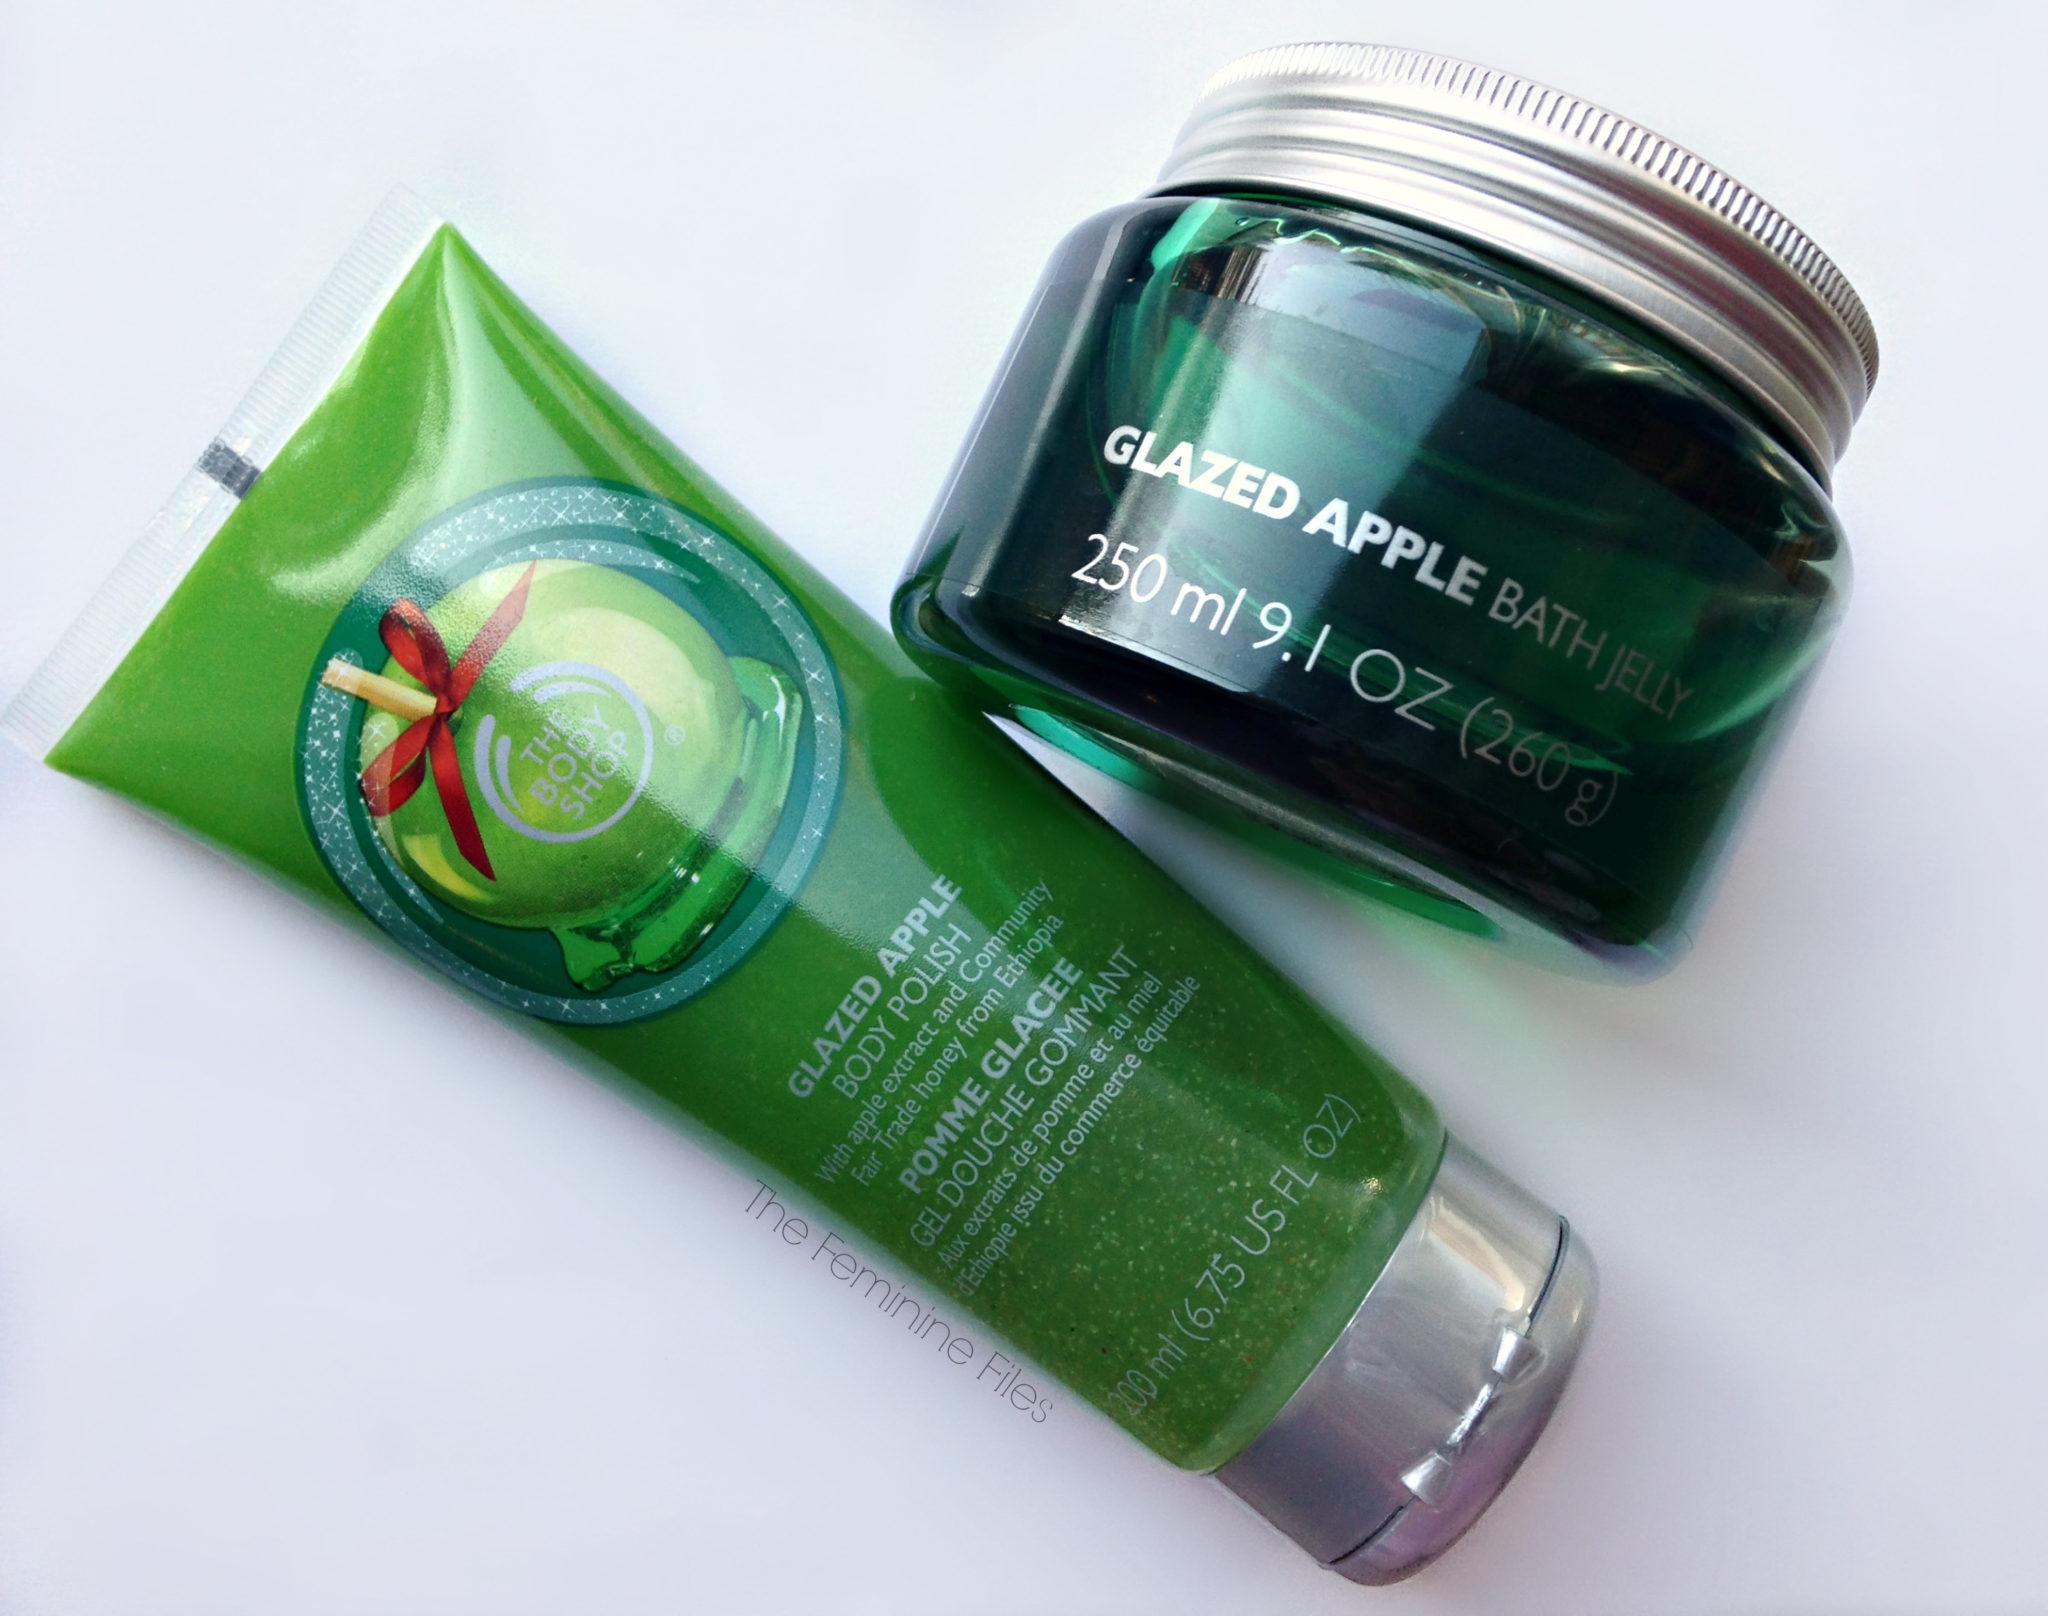 The Body Shop S Glazed Apple Body Polish Amp Bath Jelly The Feminine Files